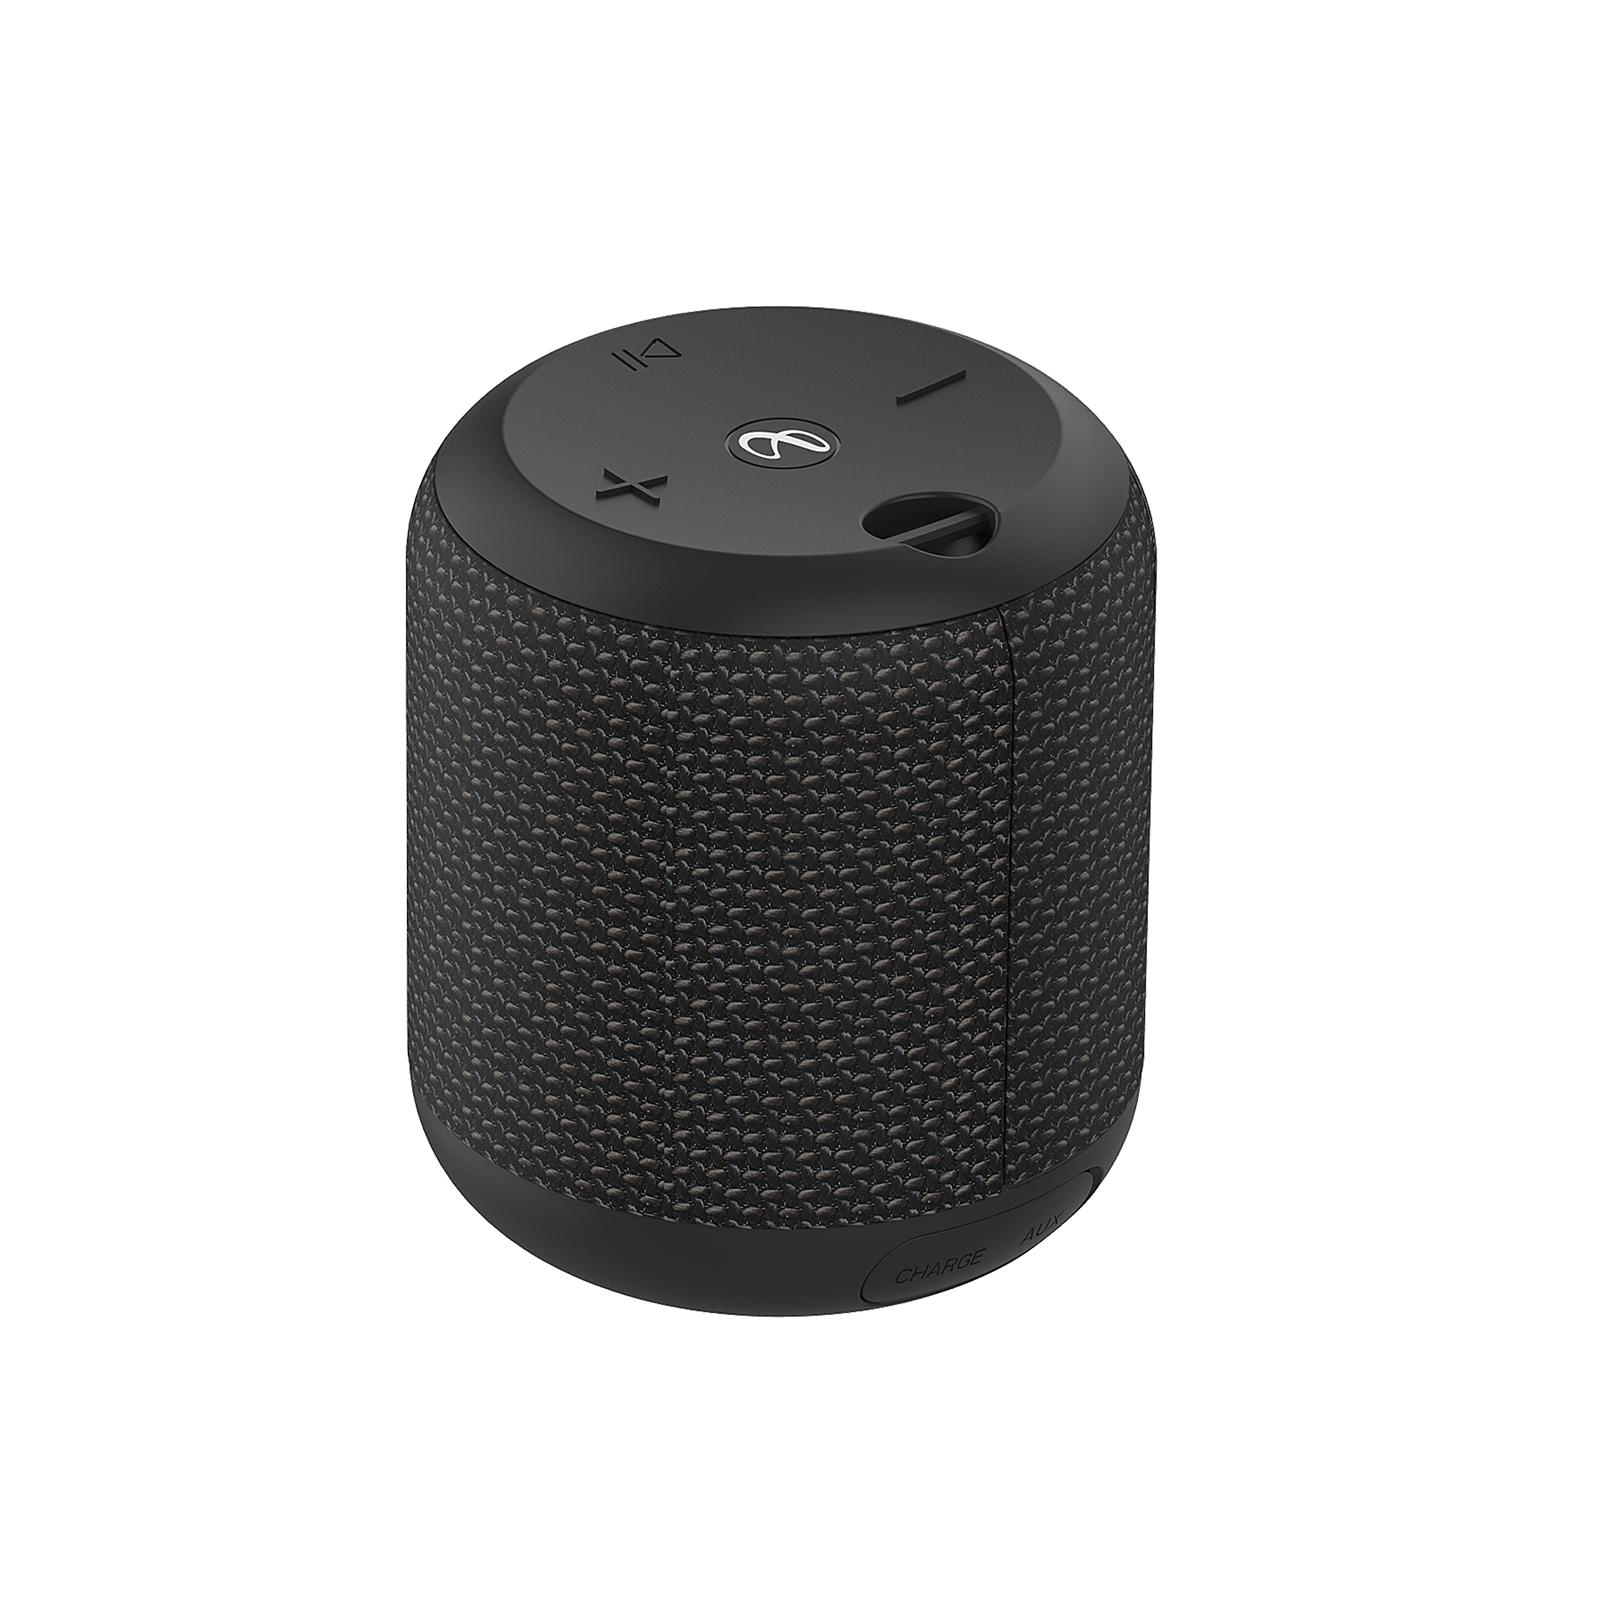 INFINITY FUZE 100 - Black - Portable Wireless Speaker - Back